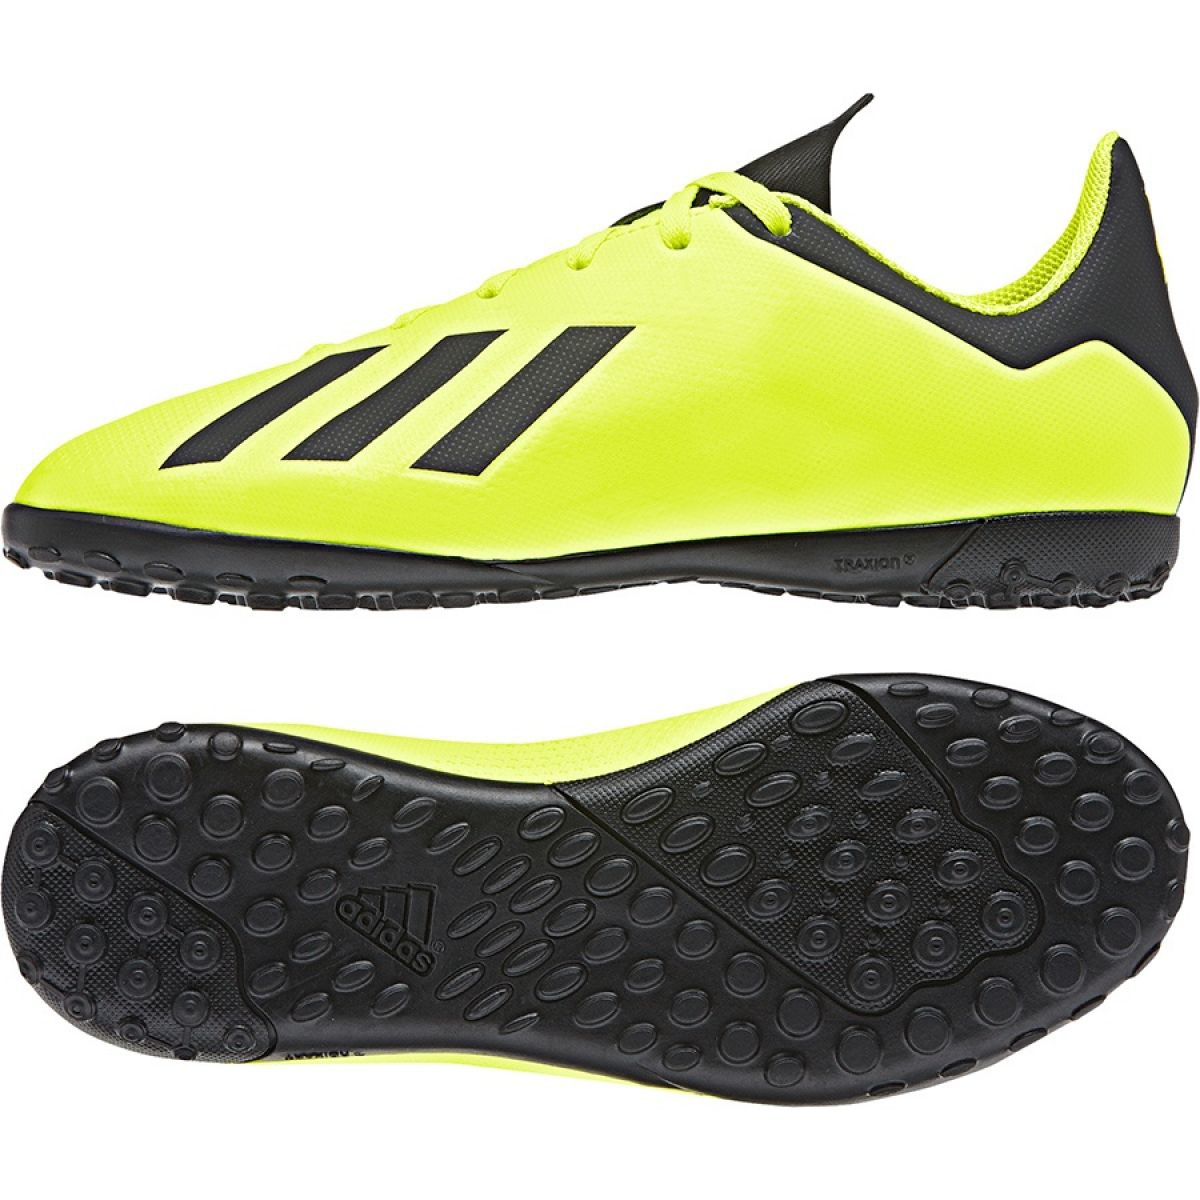 Chaussures football adidas X Tango 18.3 TF Jaune Noir Junior